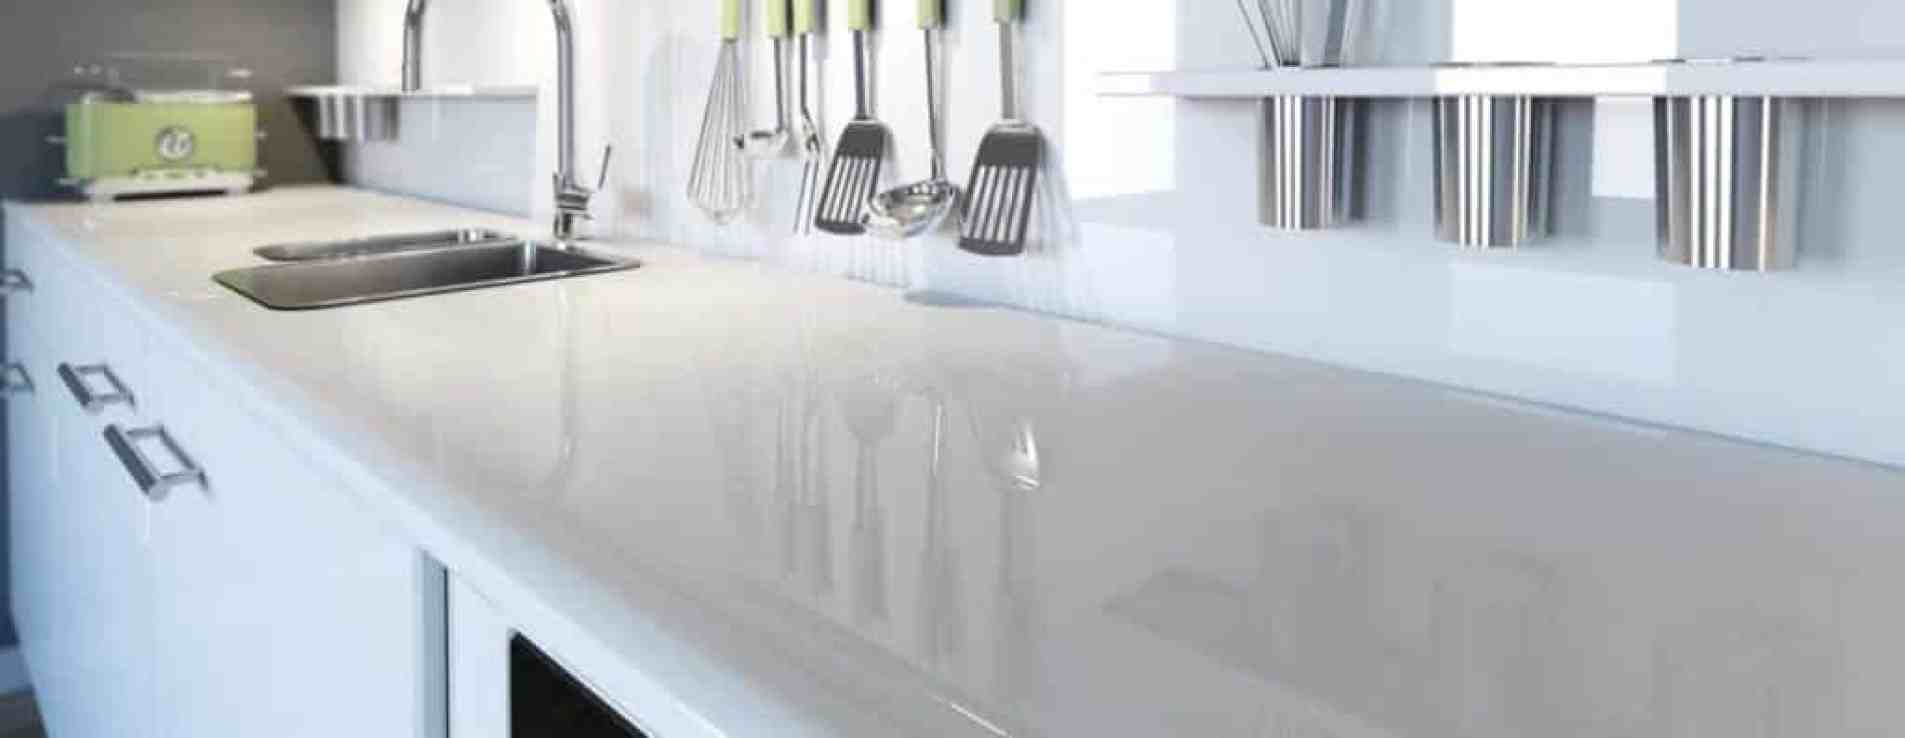 kitchen remodeling | mcmanus kitchen and bath tallahassee, fl